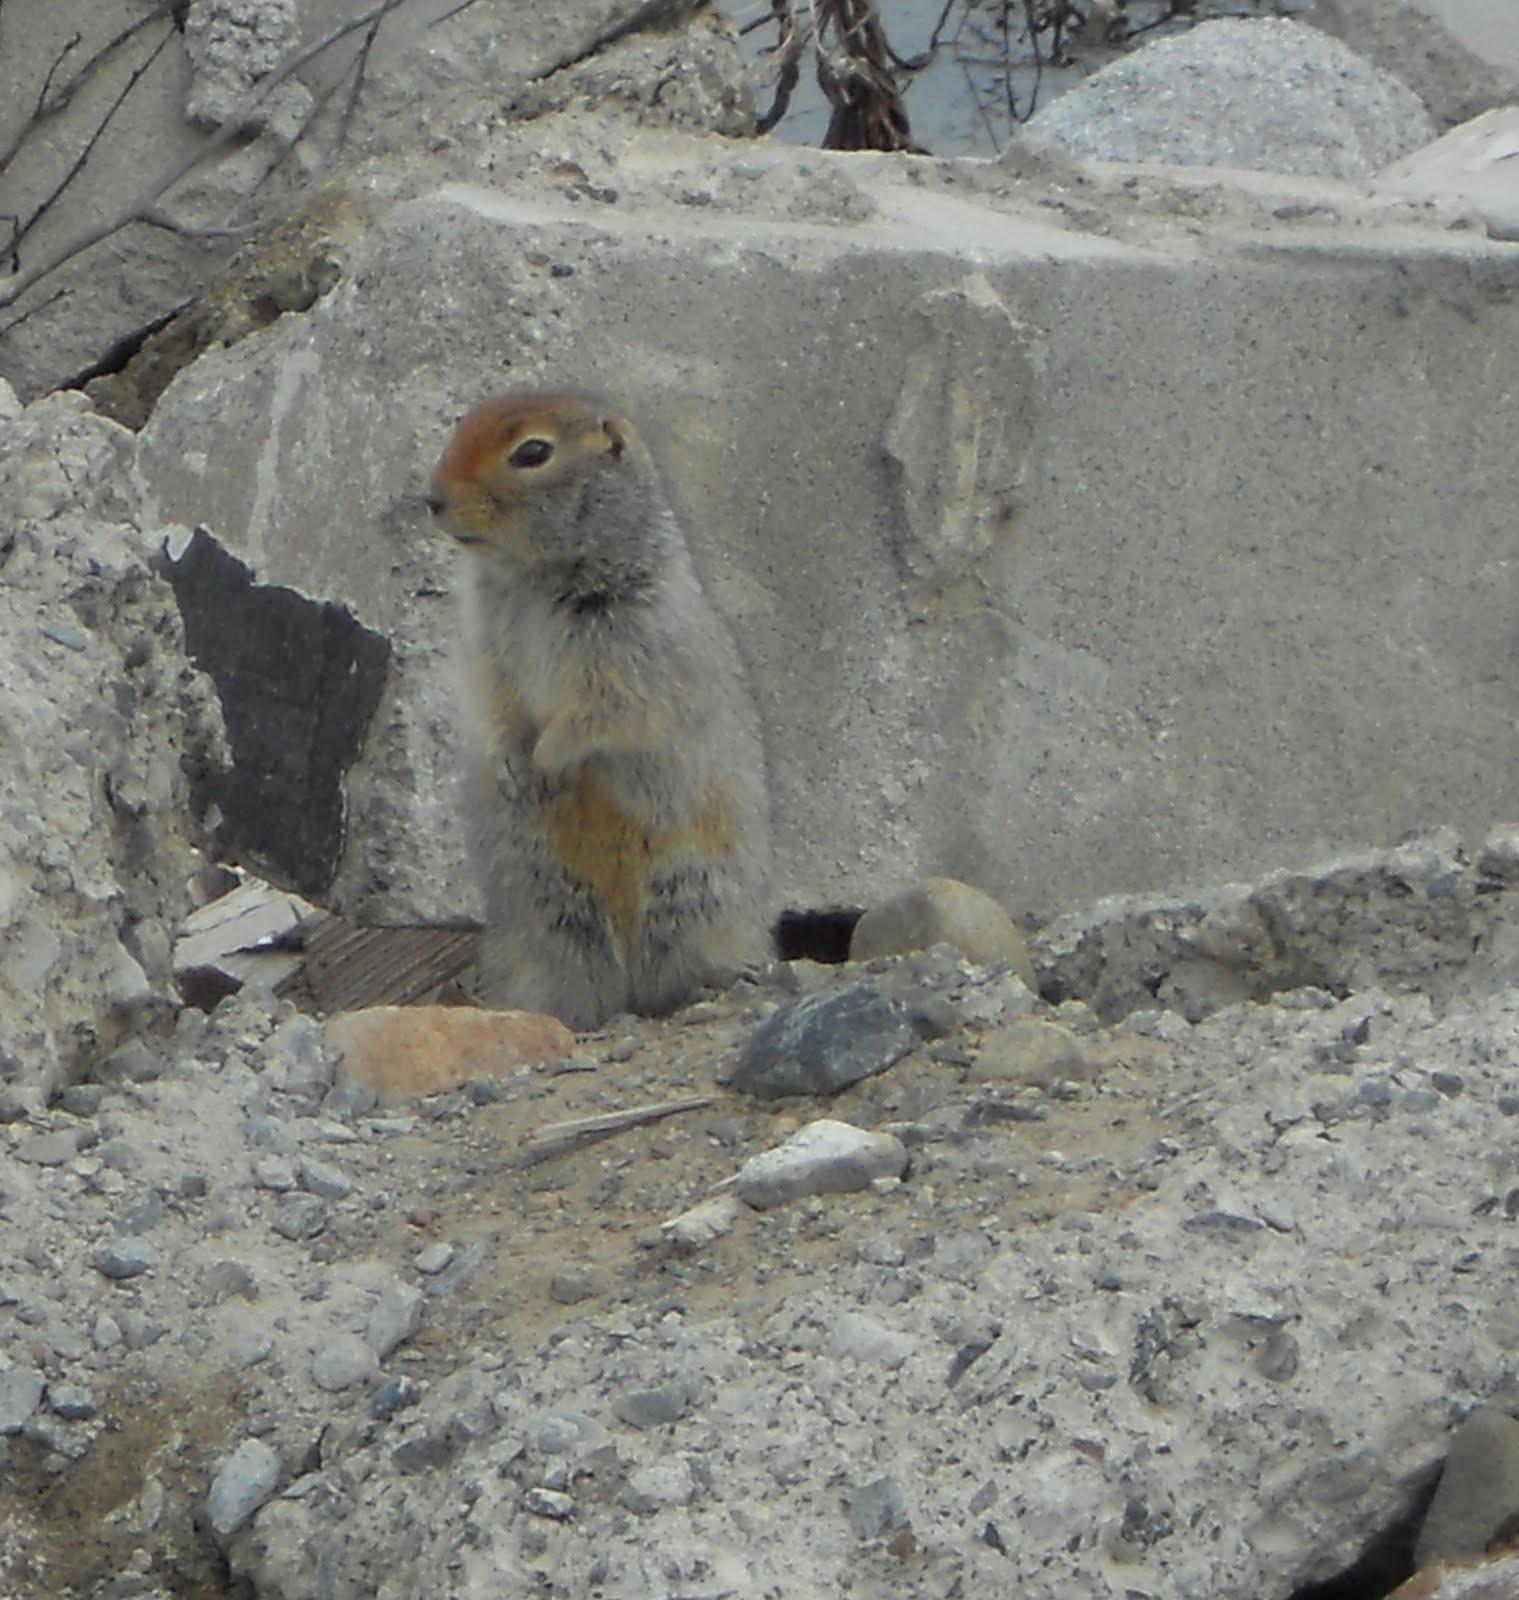 YukonNewsletter: Mai 2011